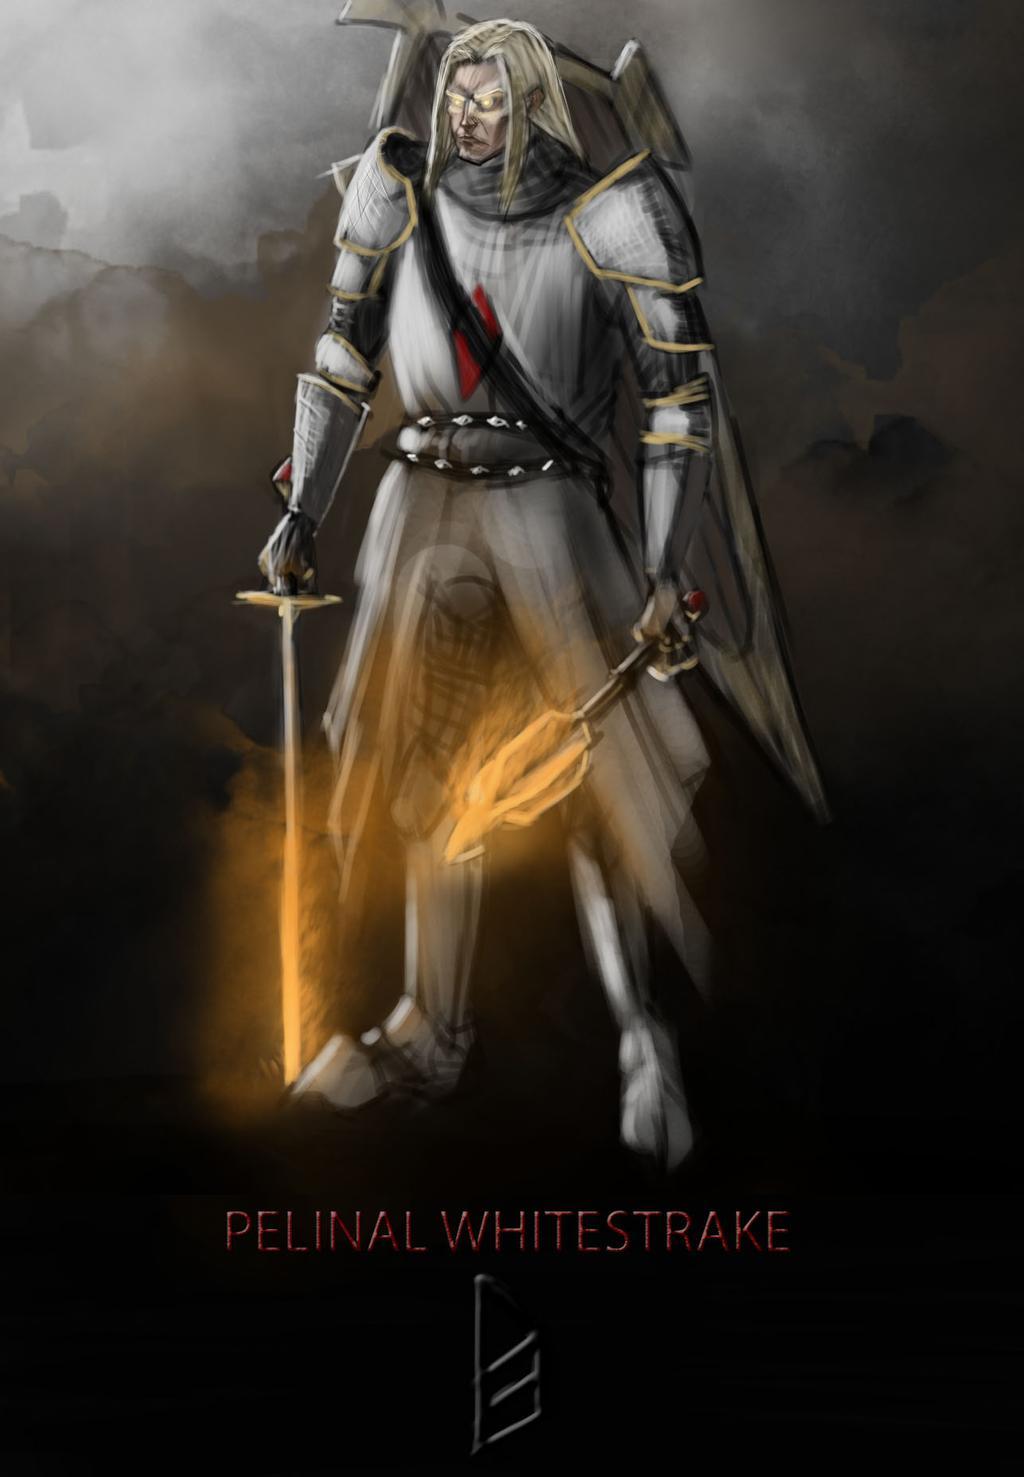 pelinal_whitestrake_by_drowsysnarkfish_d9fb076-fullview.jpg